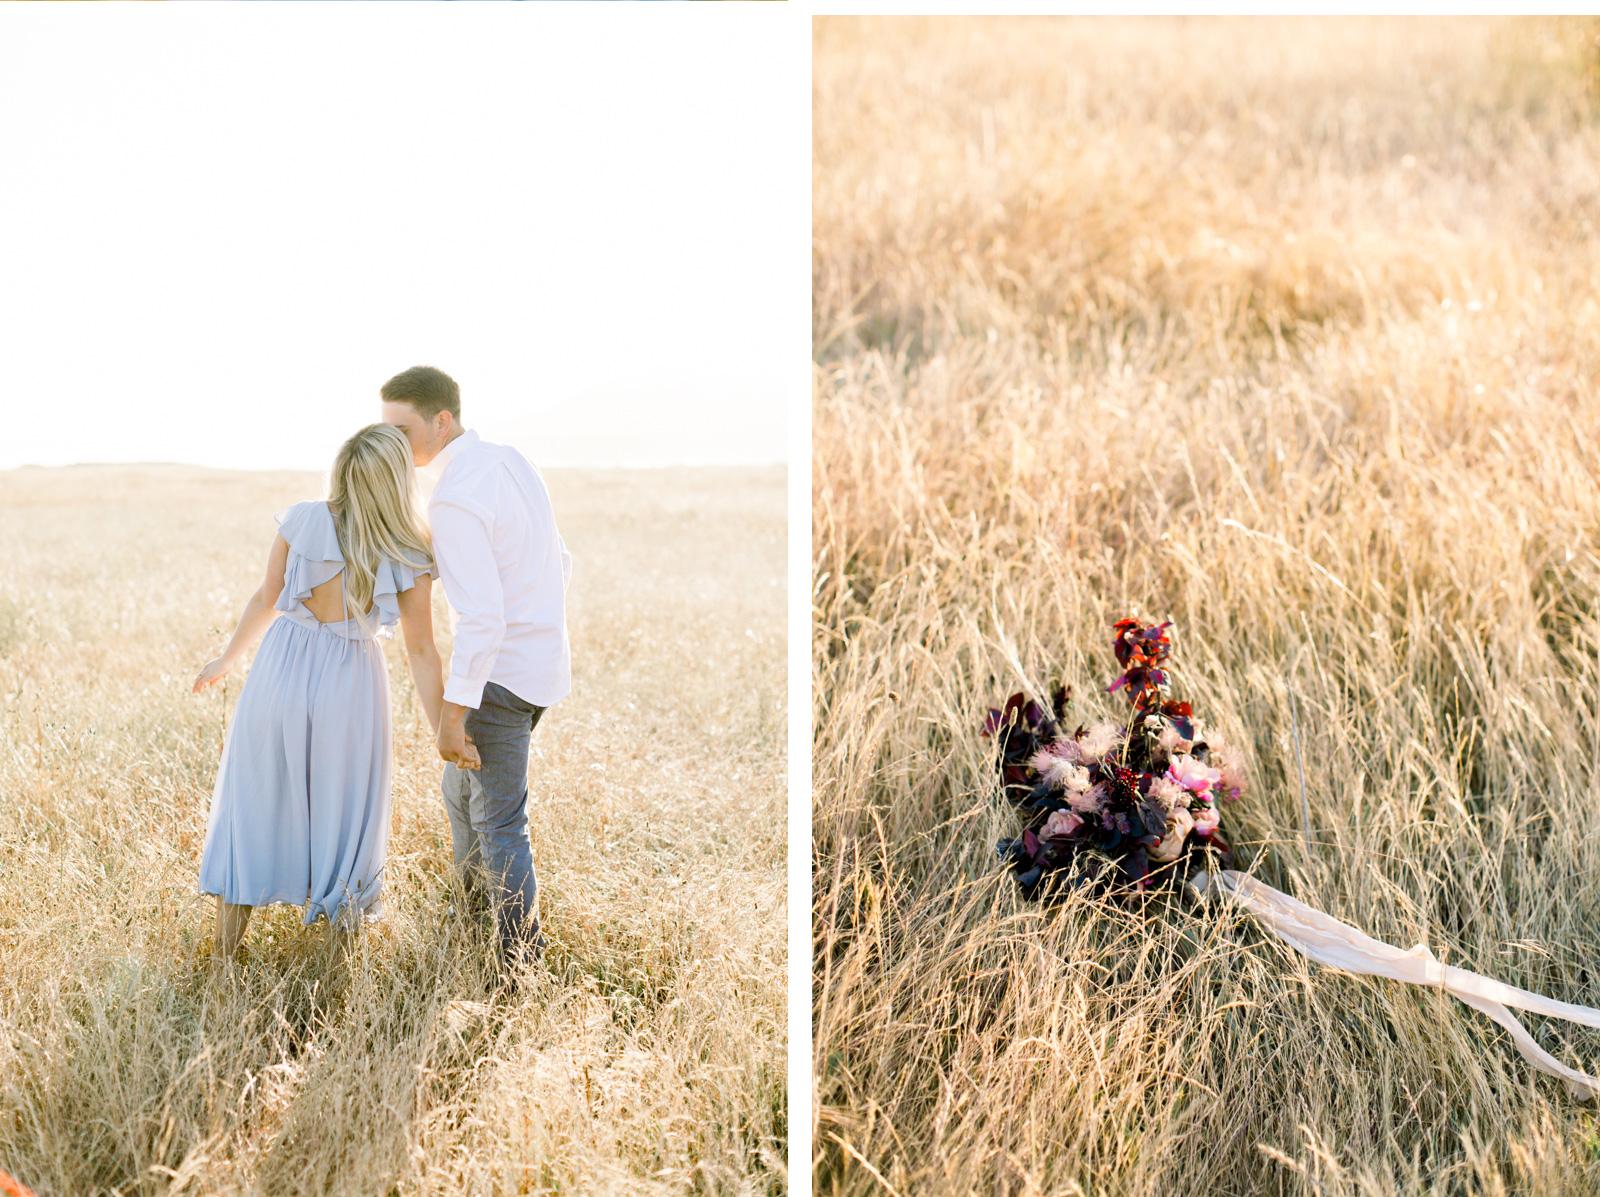 Malibu-Wedding-Photographer-Natalie-Schutt-Photography_03.jpg